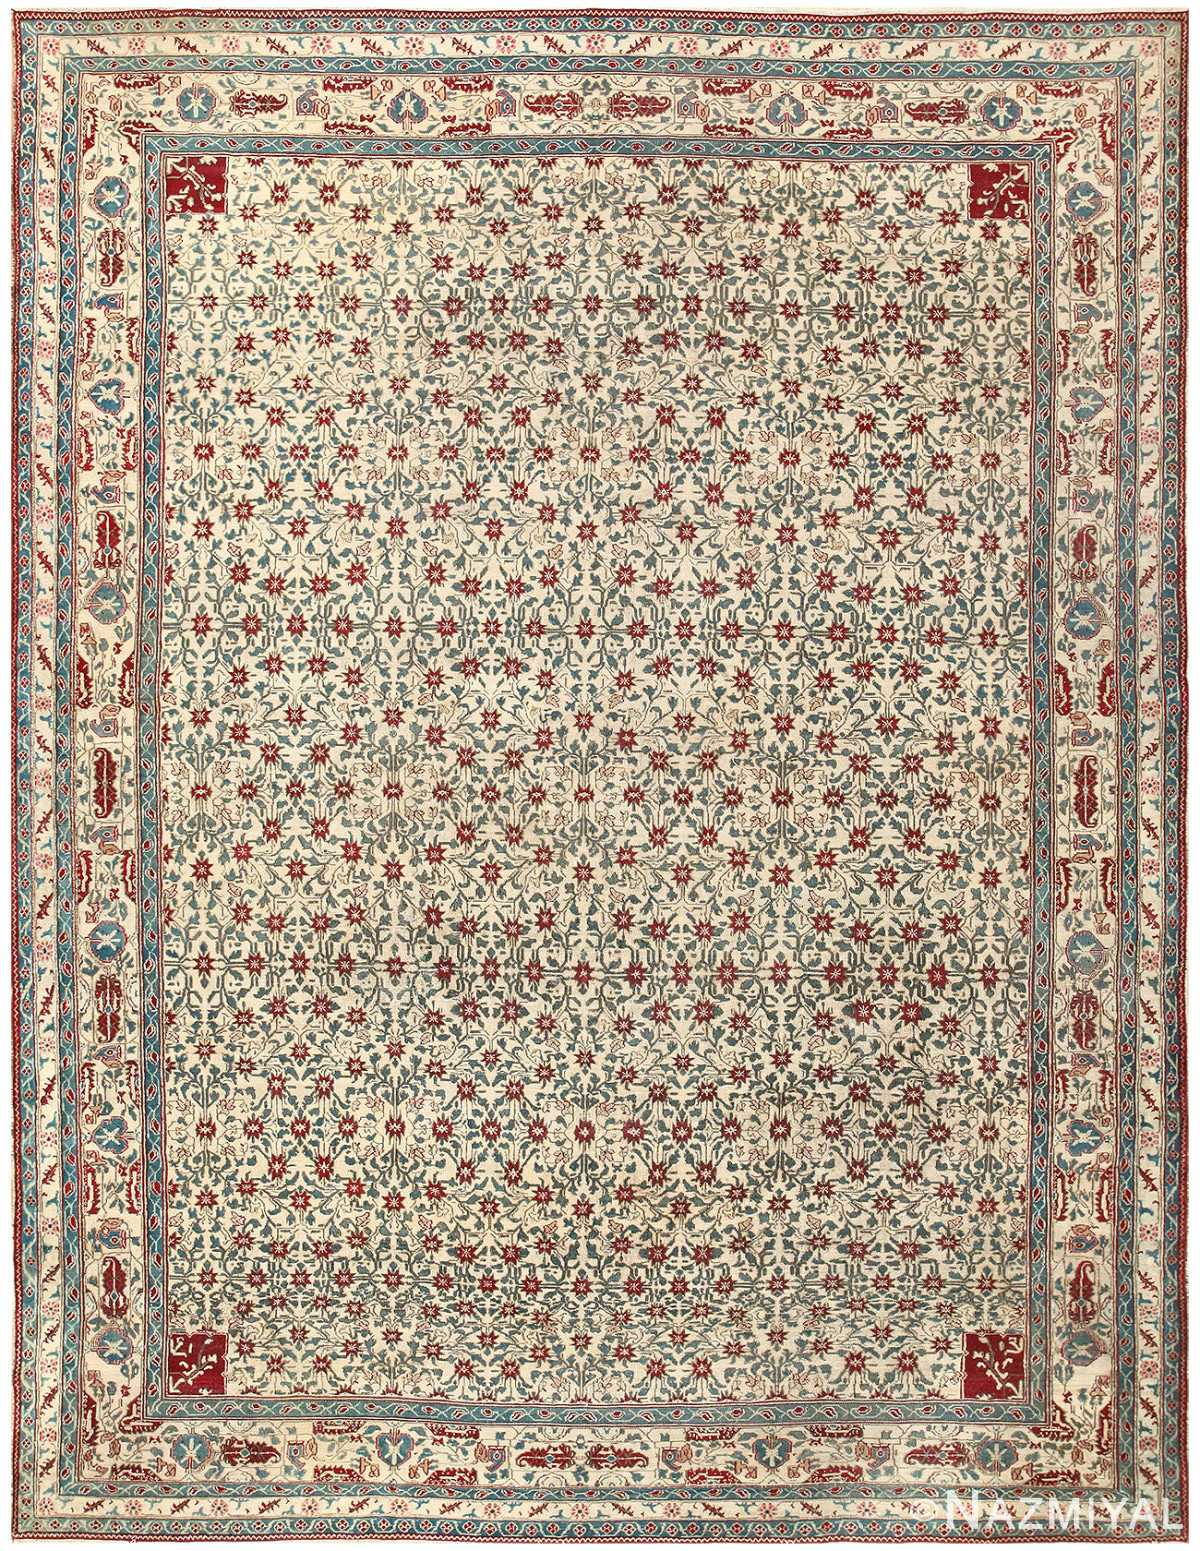 Room Sized Antique Indian Agra Rug 50180 Nazmiyal